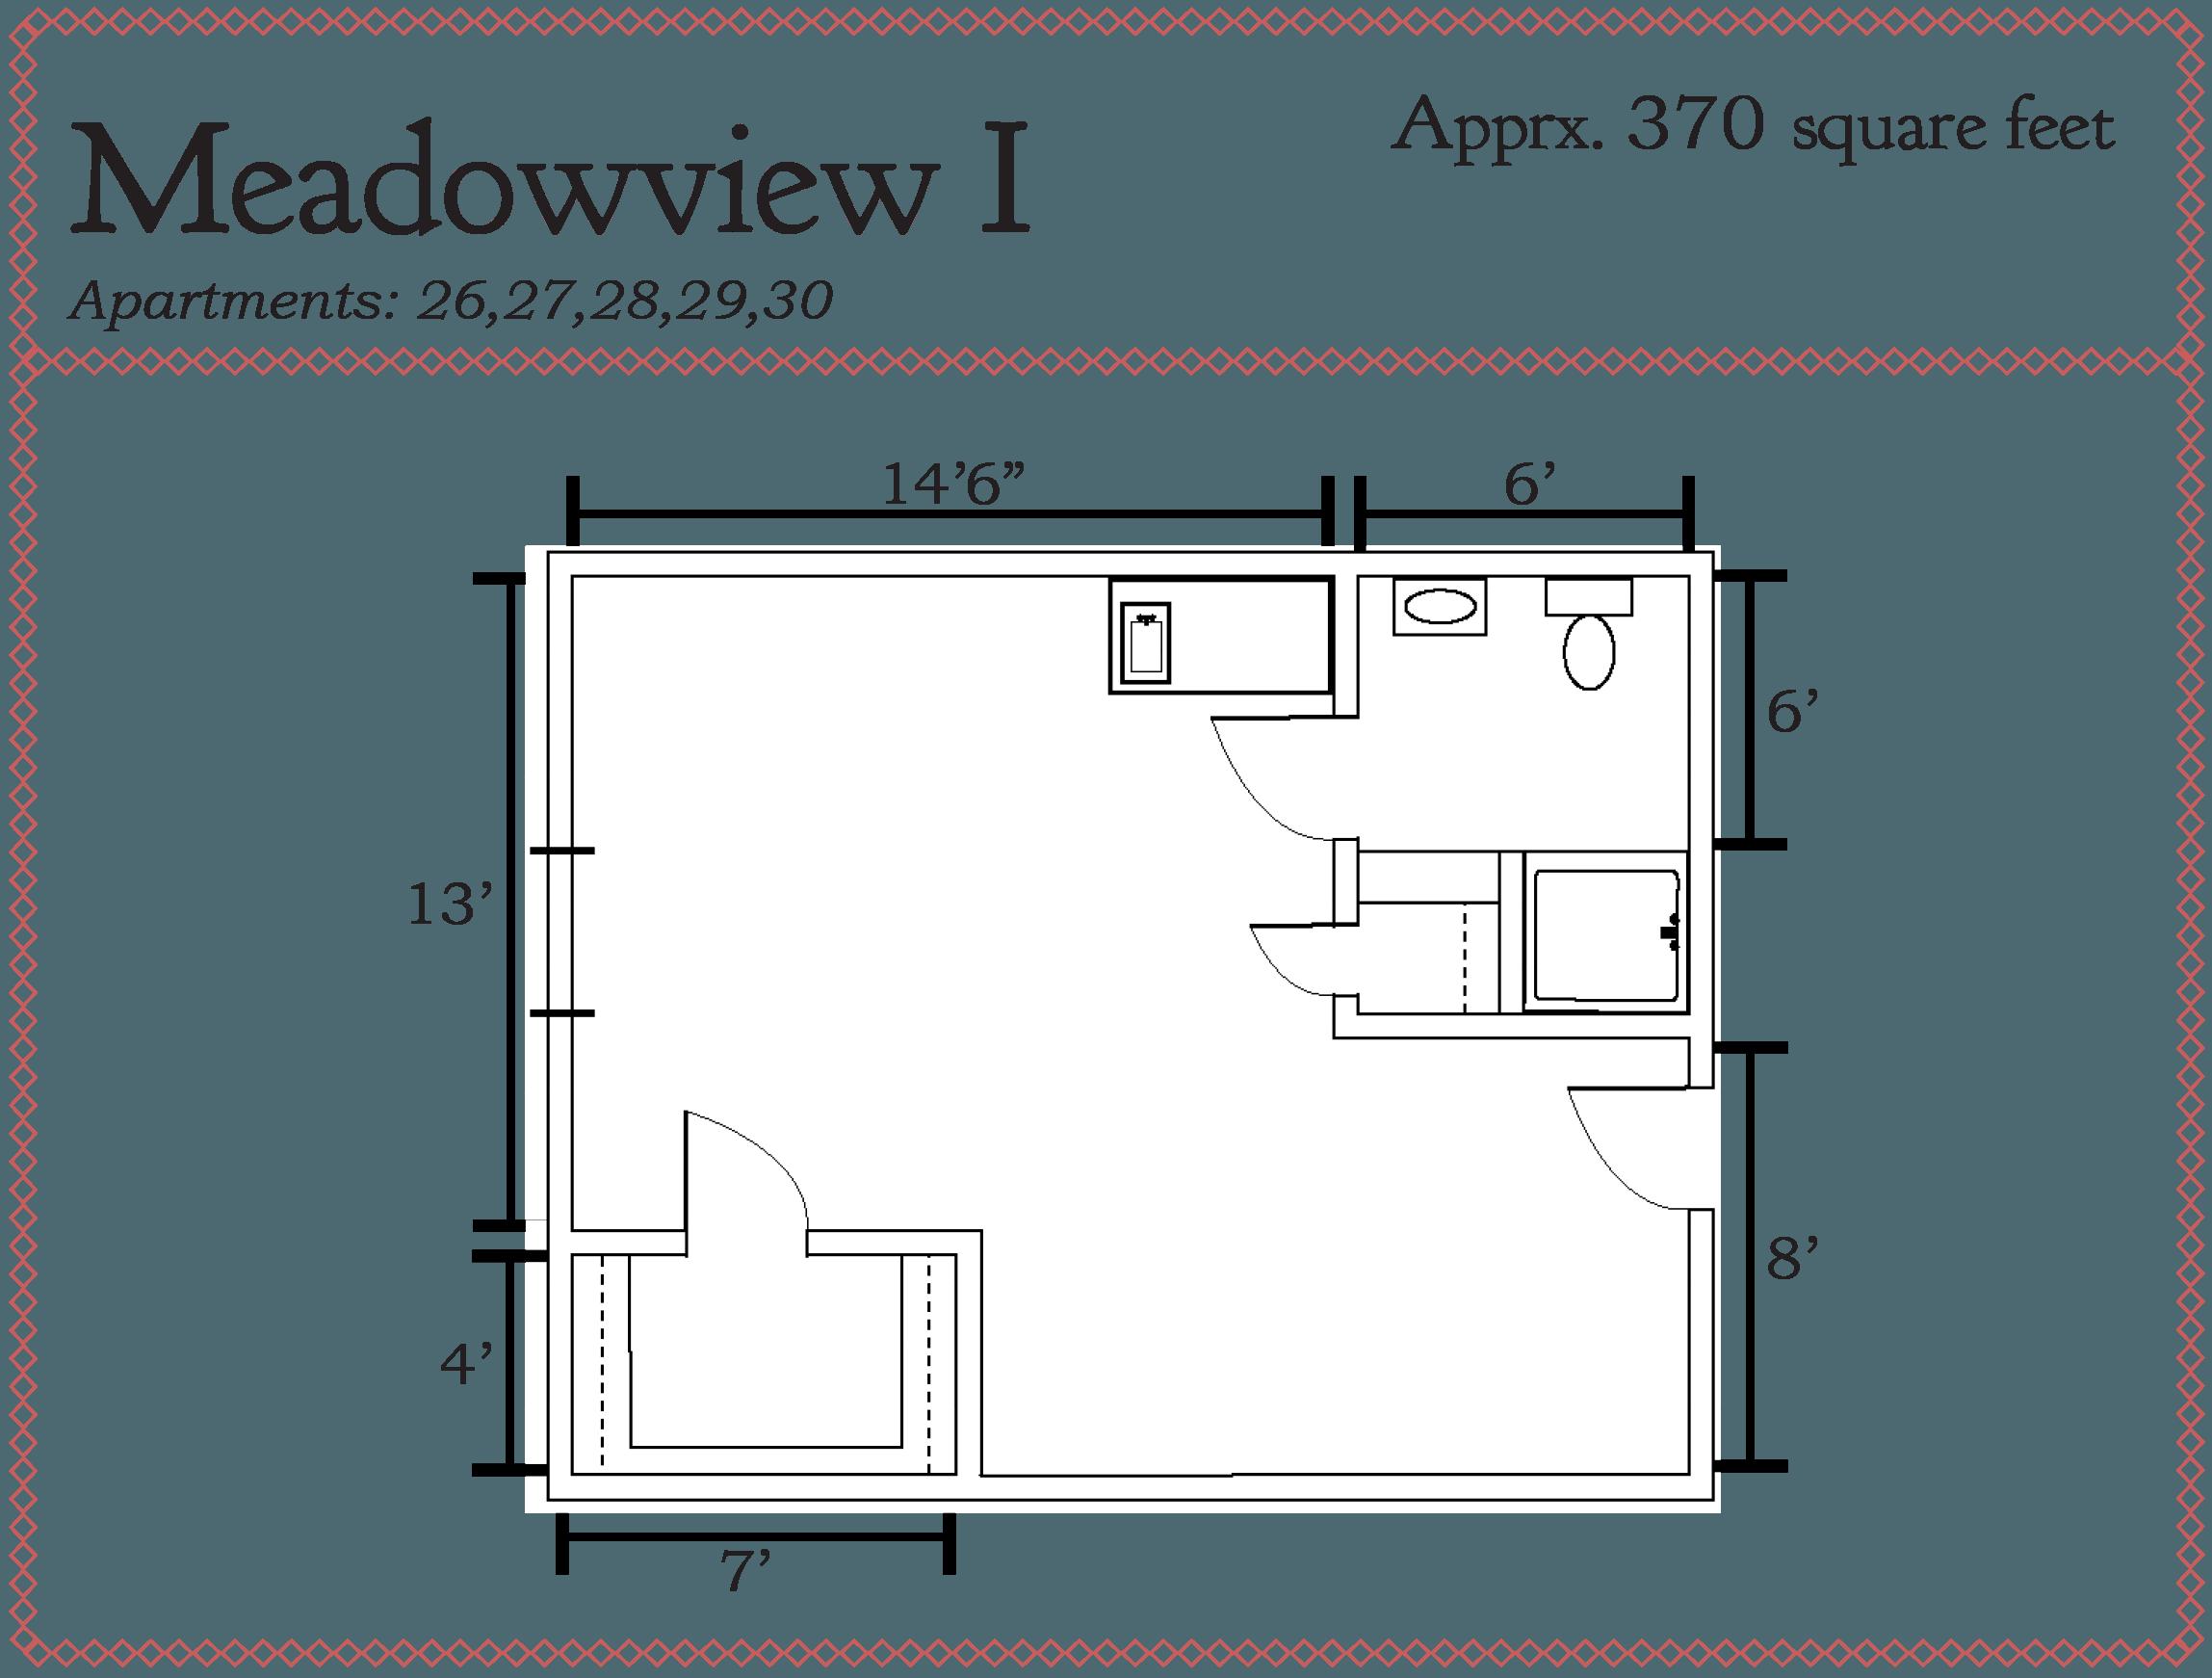 Meadowview I